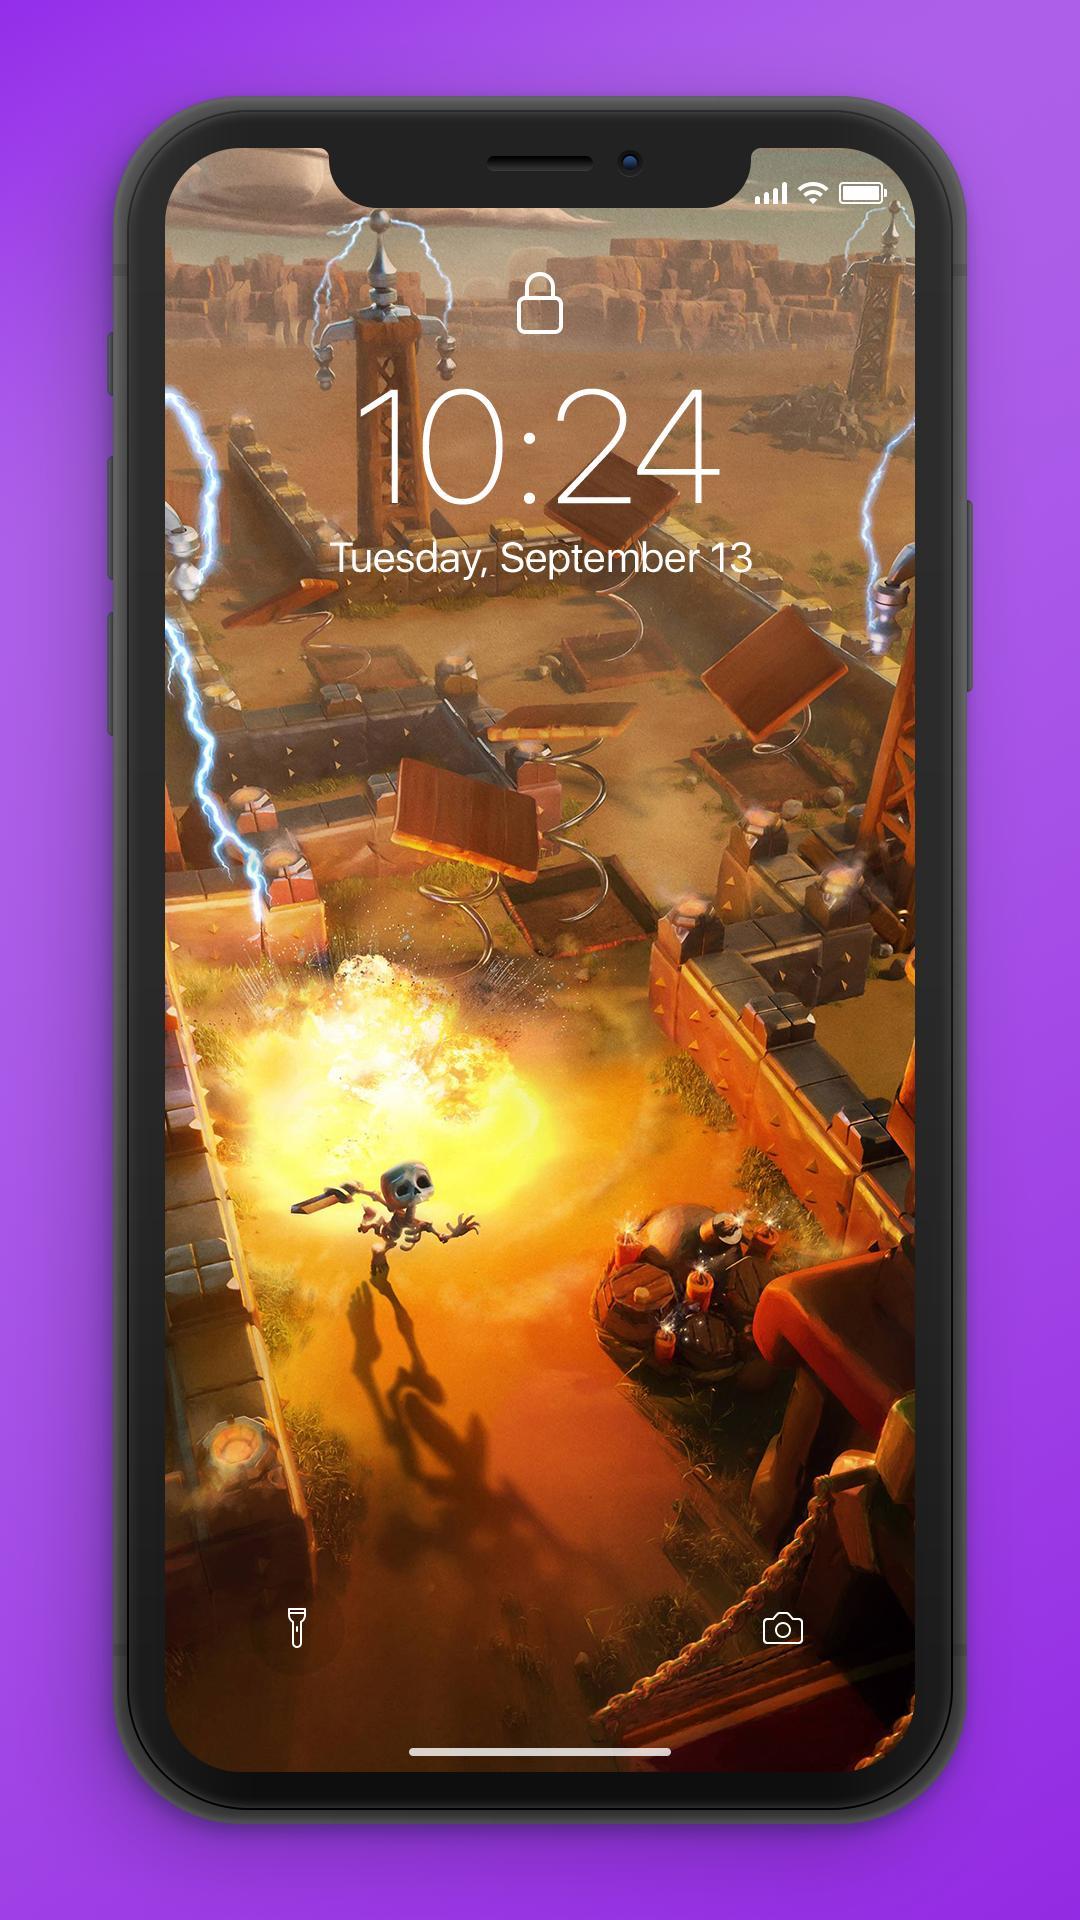 Unduh 810 Wallpaper Android Clash Royale Paling Keren